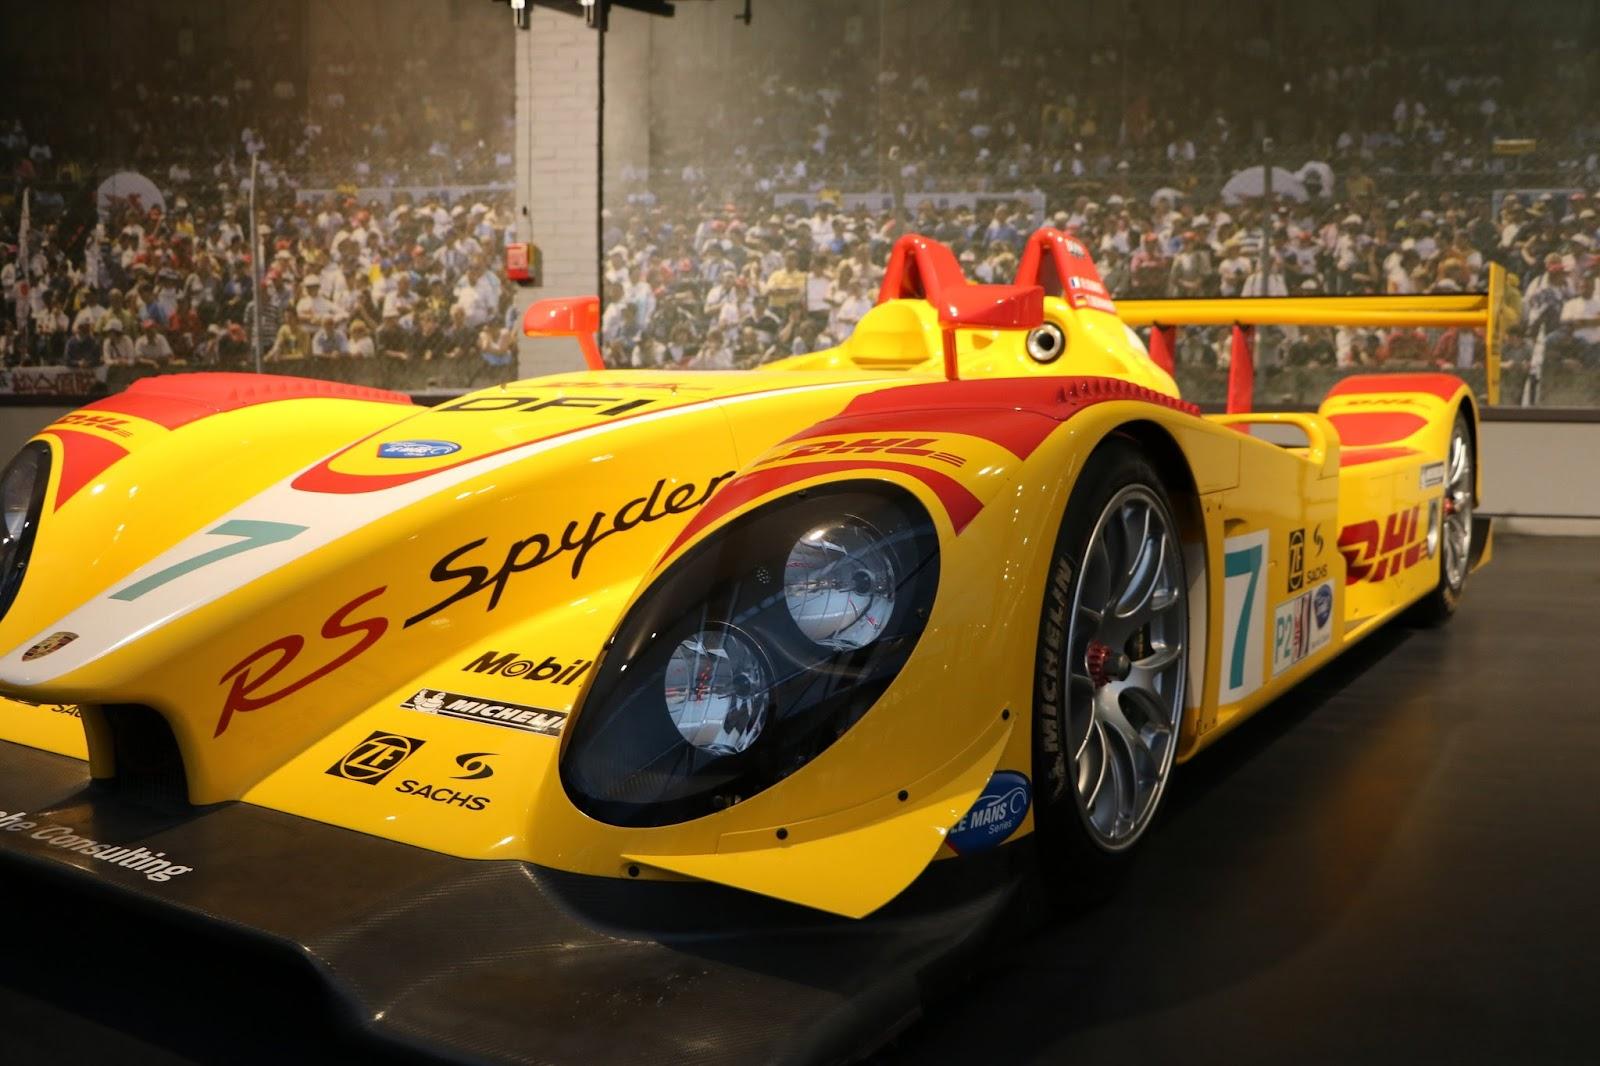 Schlumpf Collection 1066 - 2006 Porsche RS Spyder.jpg